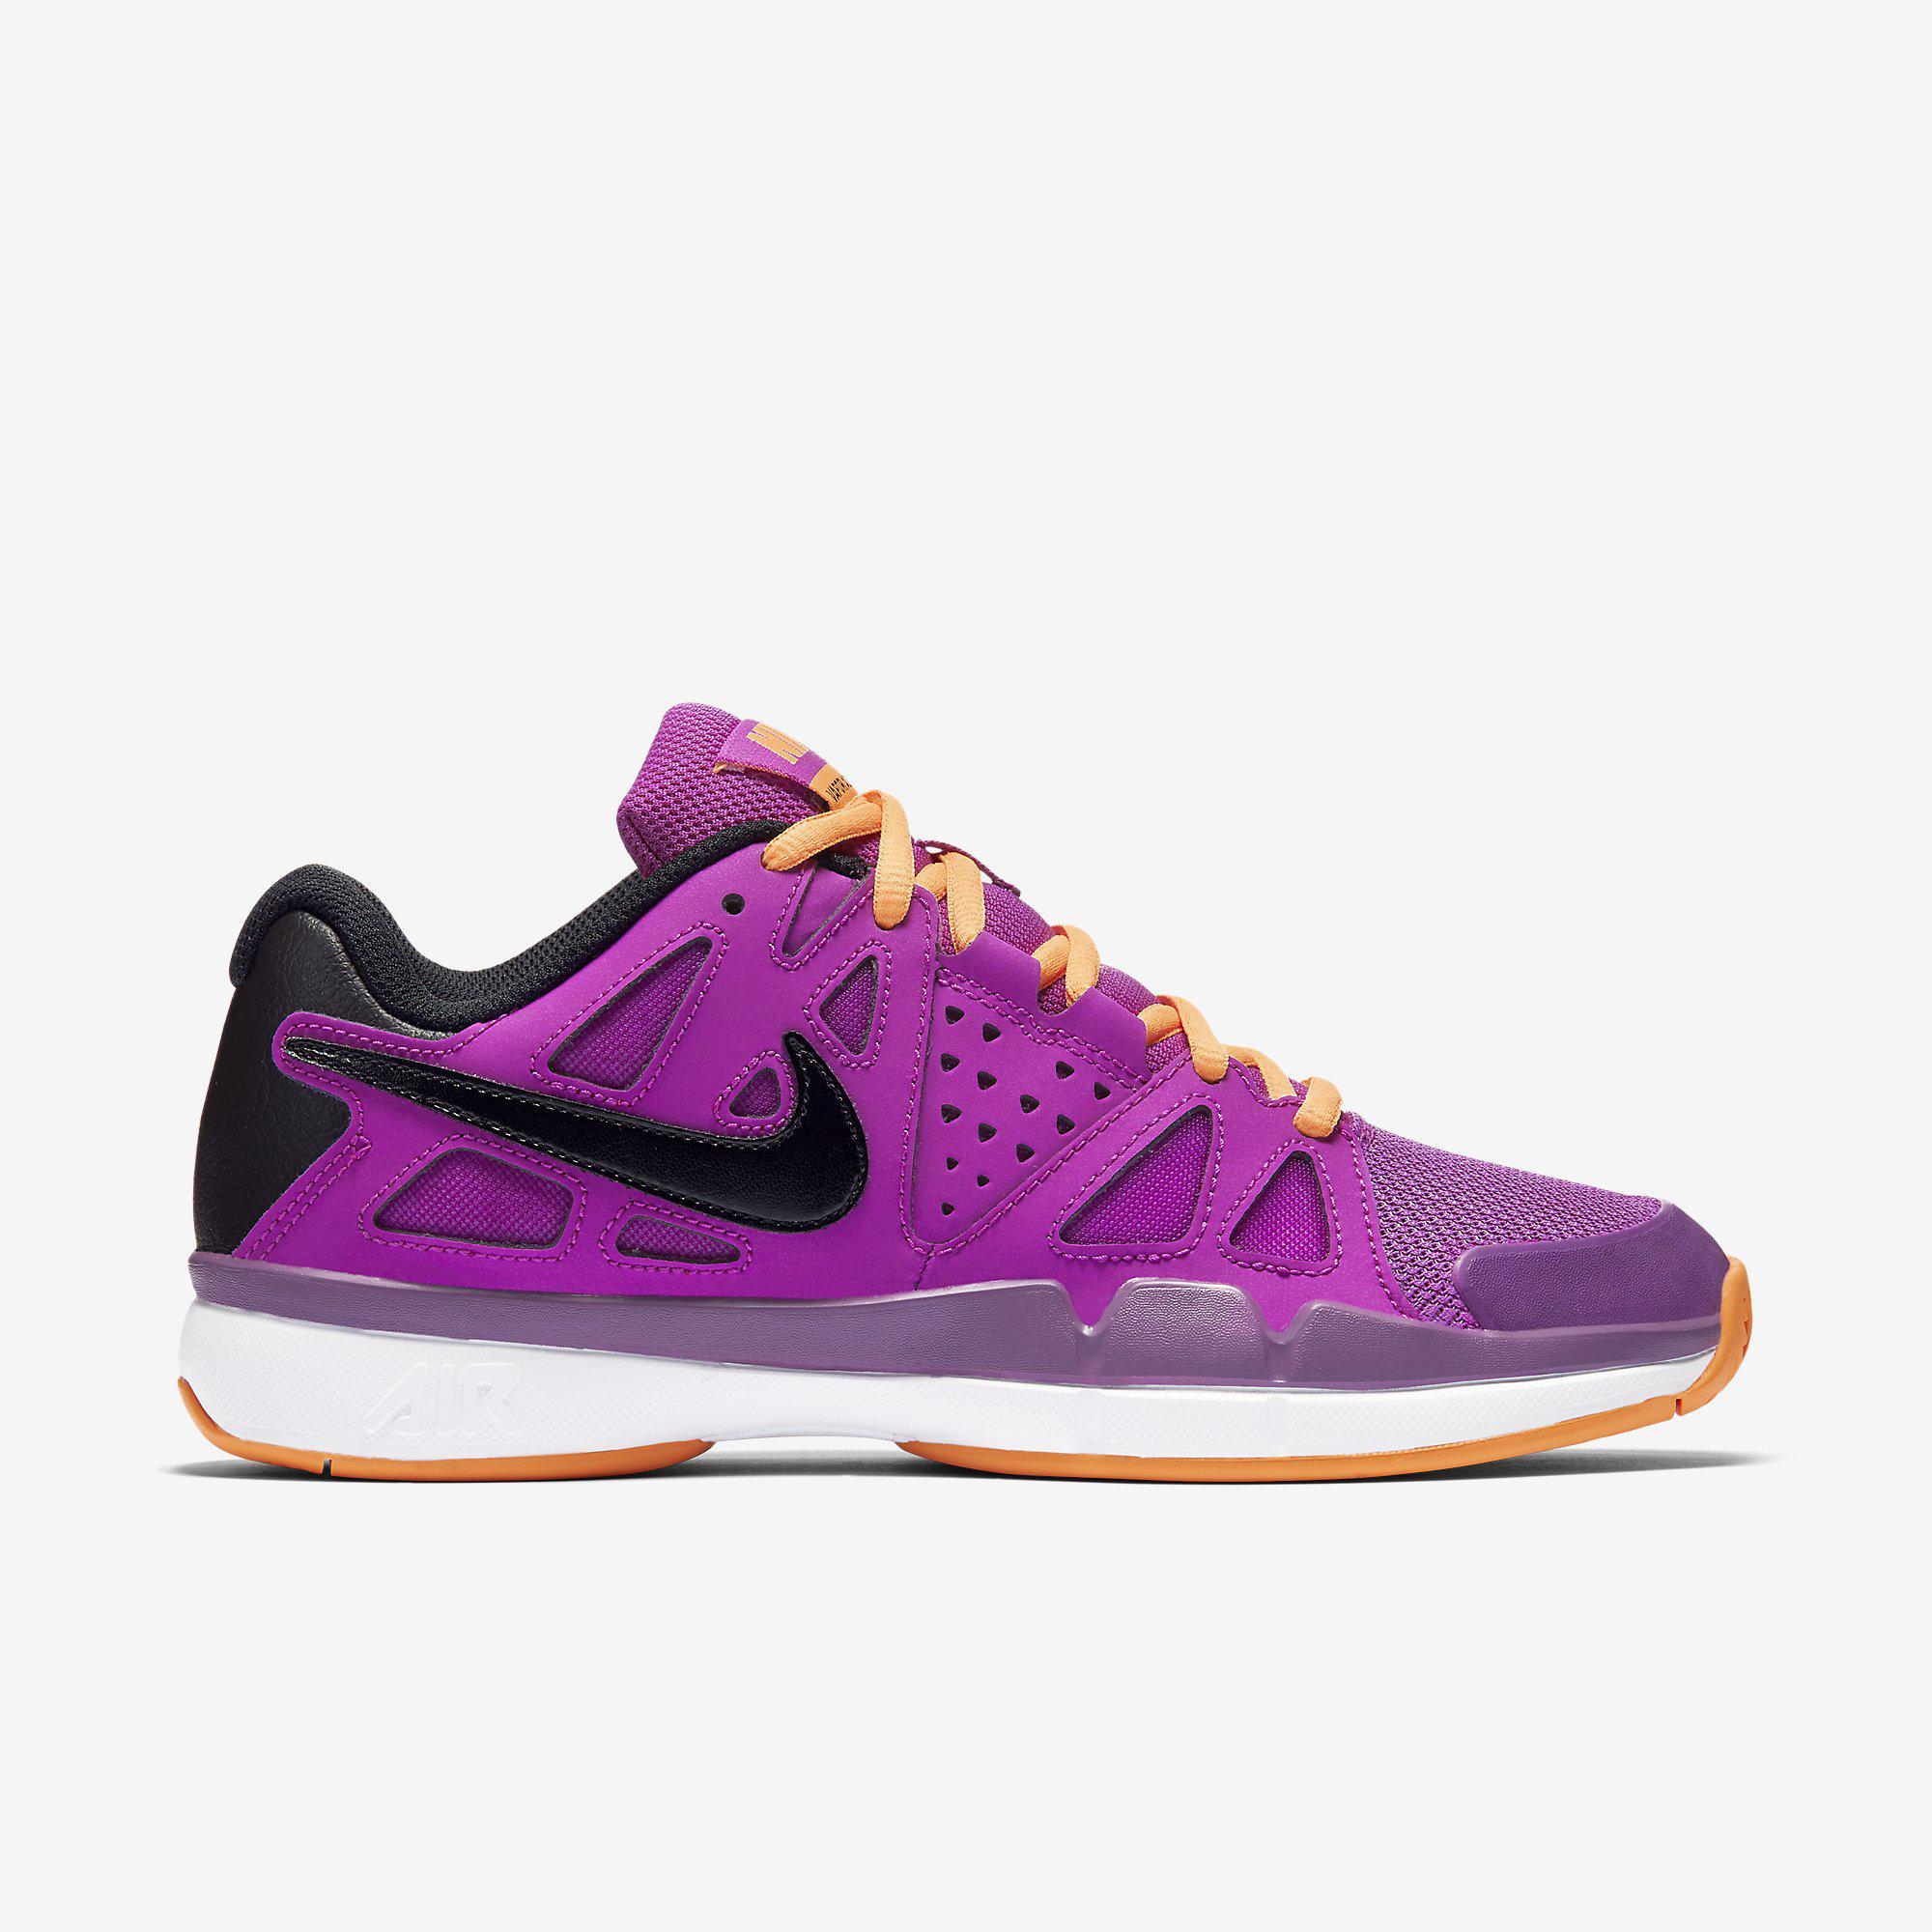 Nike Womens Air Vapor Advantage Tennis Shoes - Hyper Violet - Tennisnuts.com